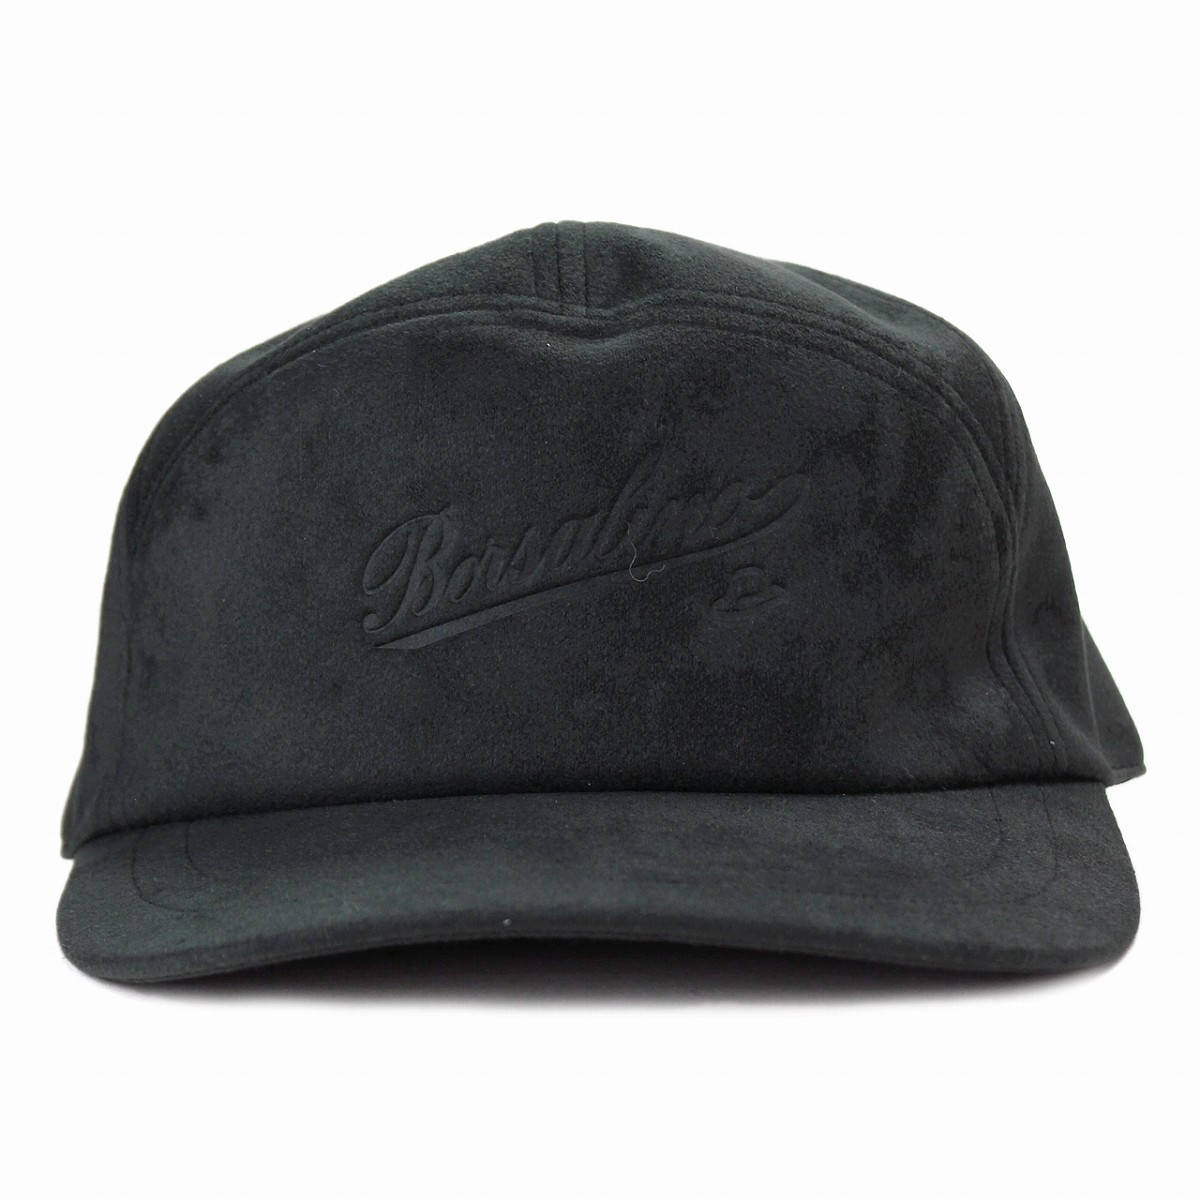 191ff14be81 Baseball cap gentleman adult Shin pull S M L LL 3L back adjuster size  adjustable fashion   dark gray  baseball cap  Christmas present Borsalino  hat mail ...